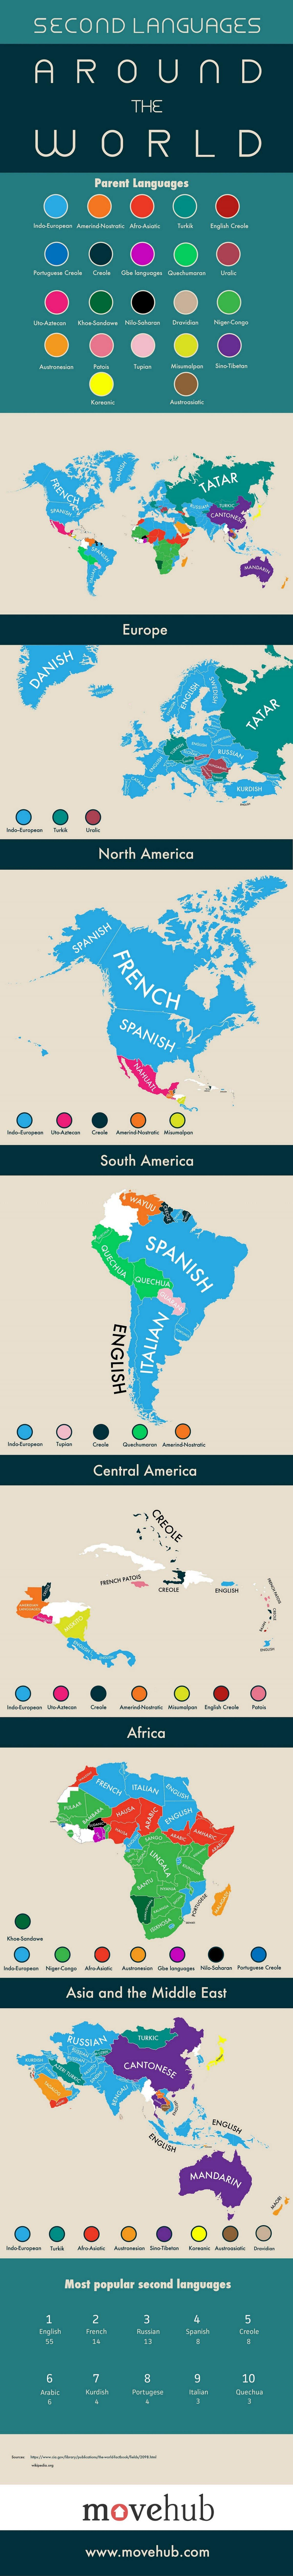 second-languages-map-1350px